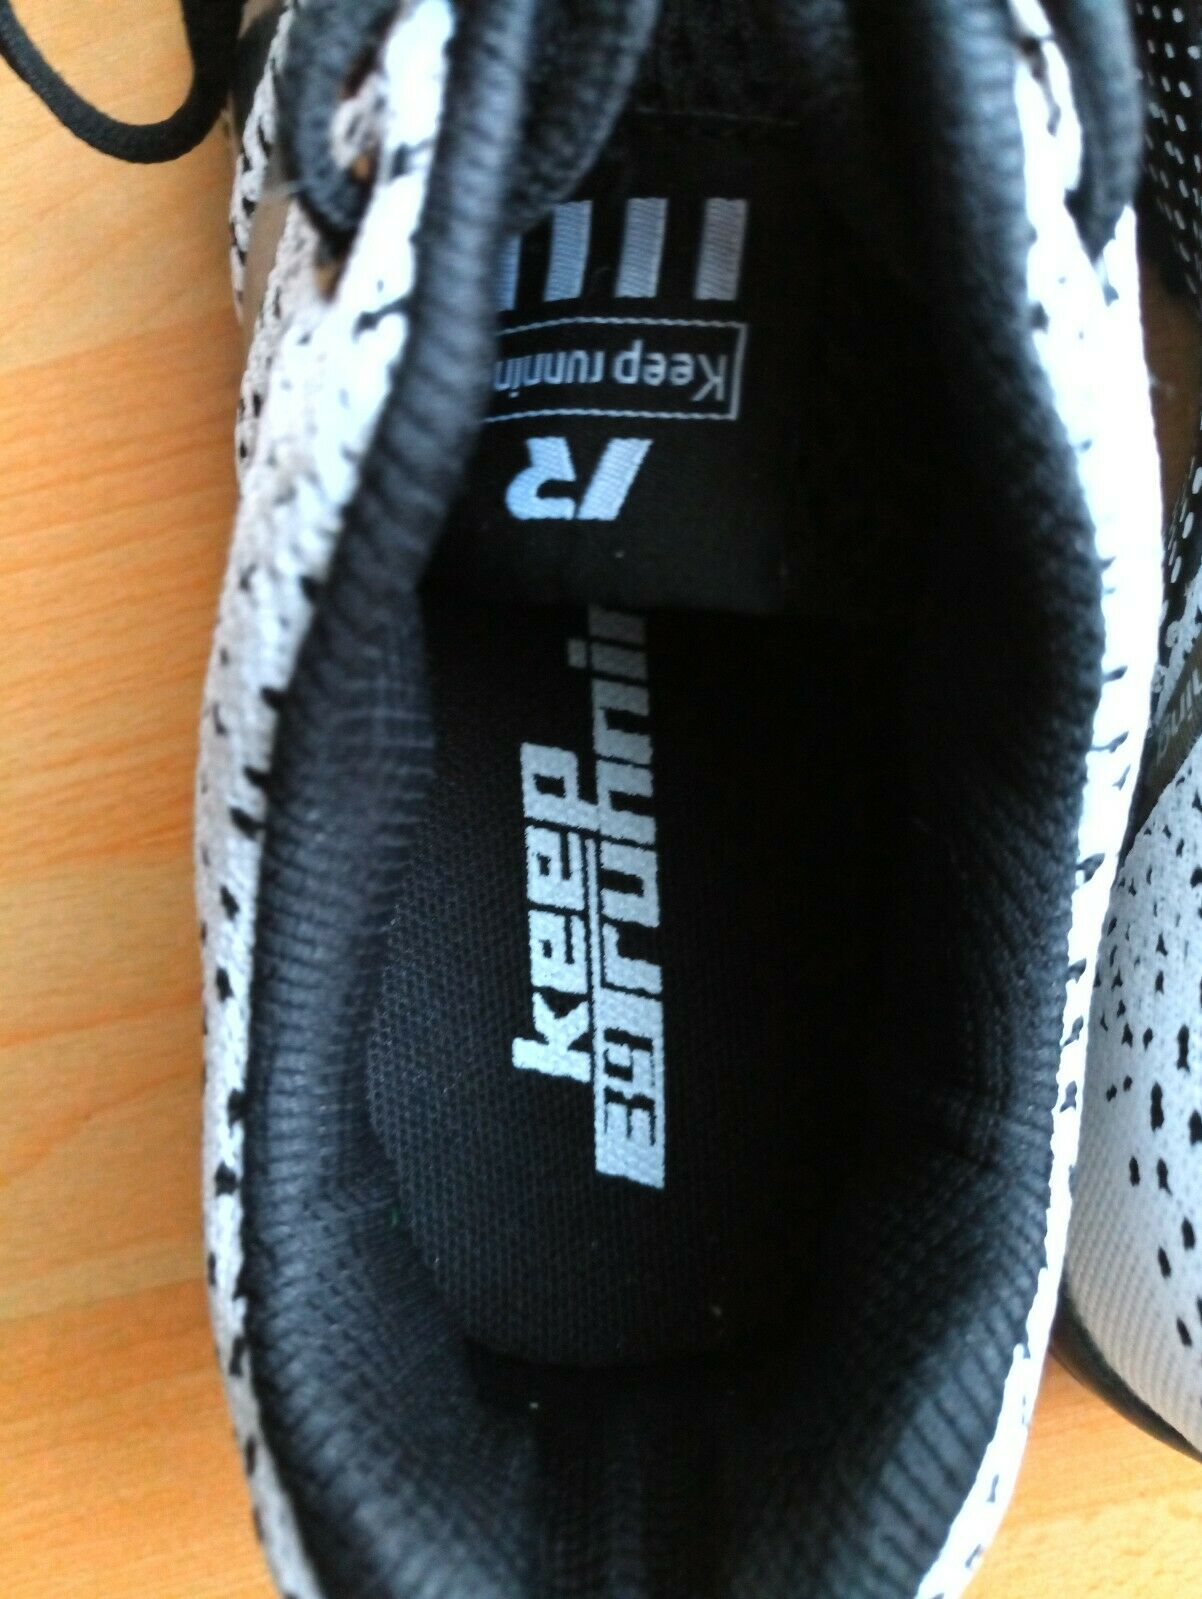 Laufschuhe   Sportschuhe,Herren,    Keep Running ,schwarz  weiß  Gr. 39, NEU c747f2